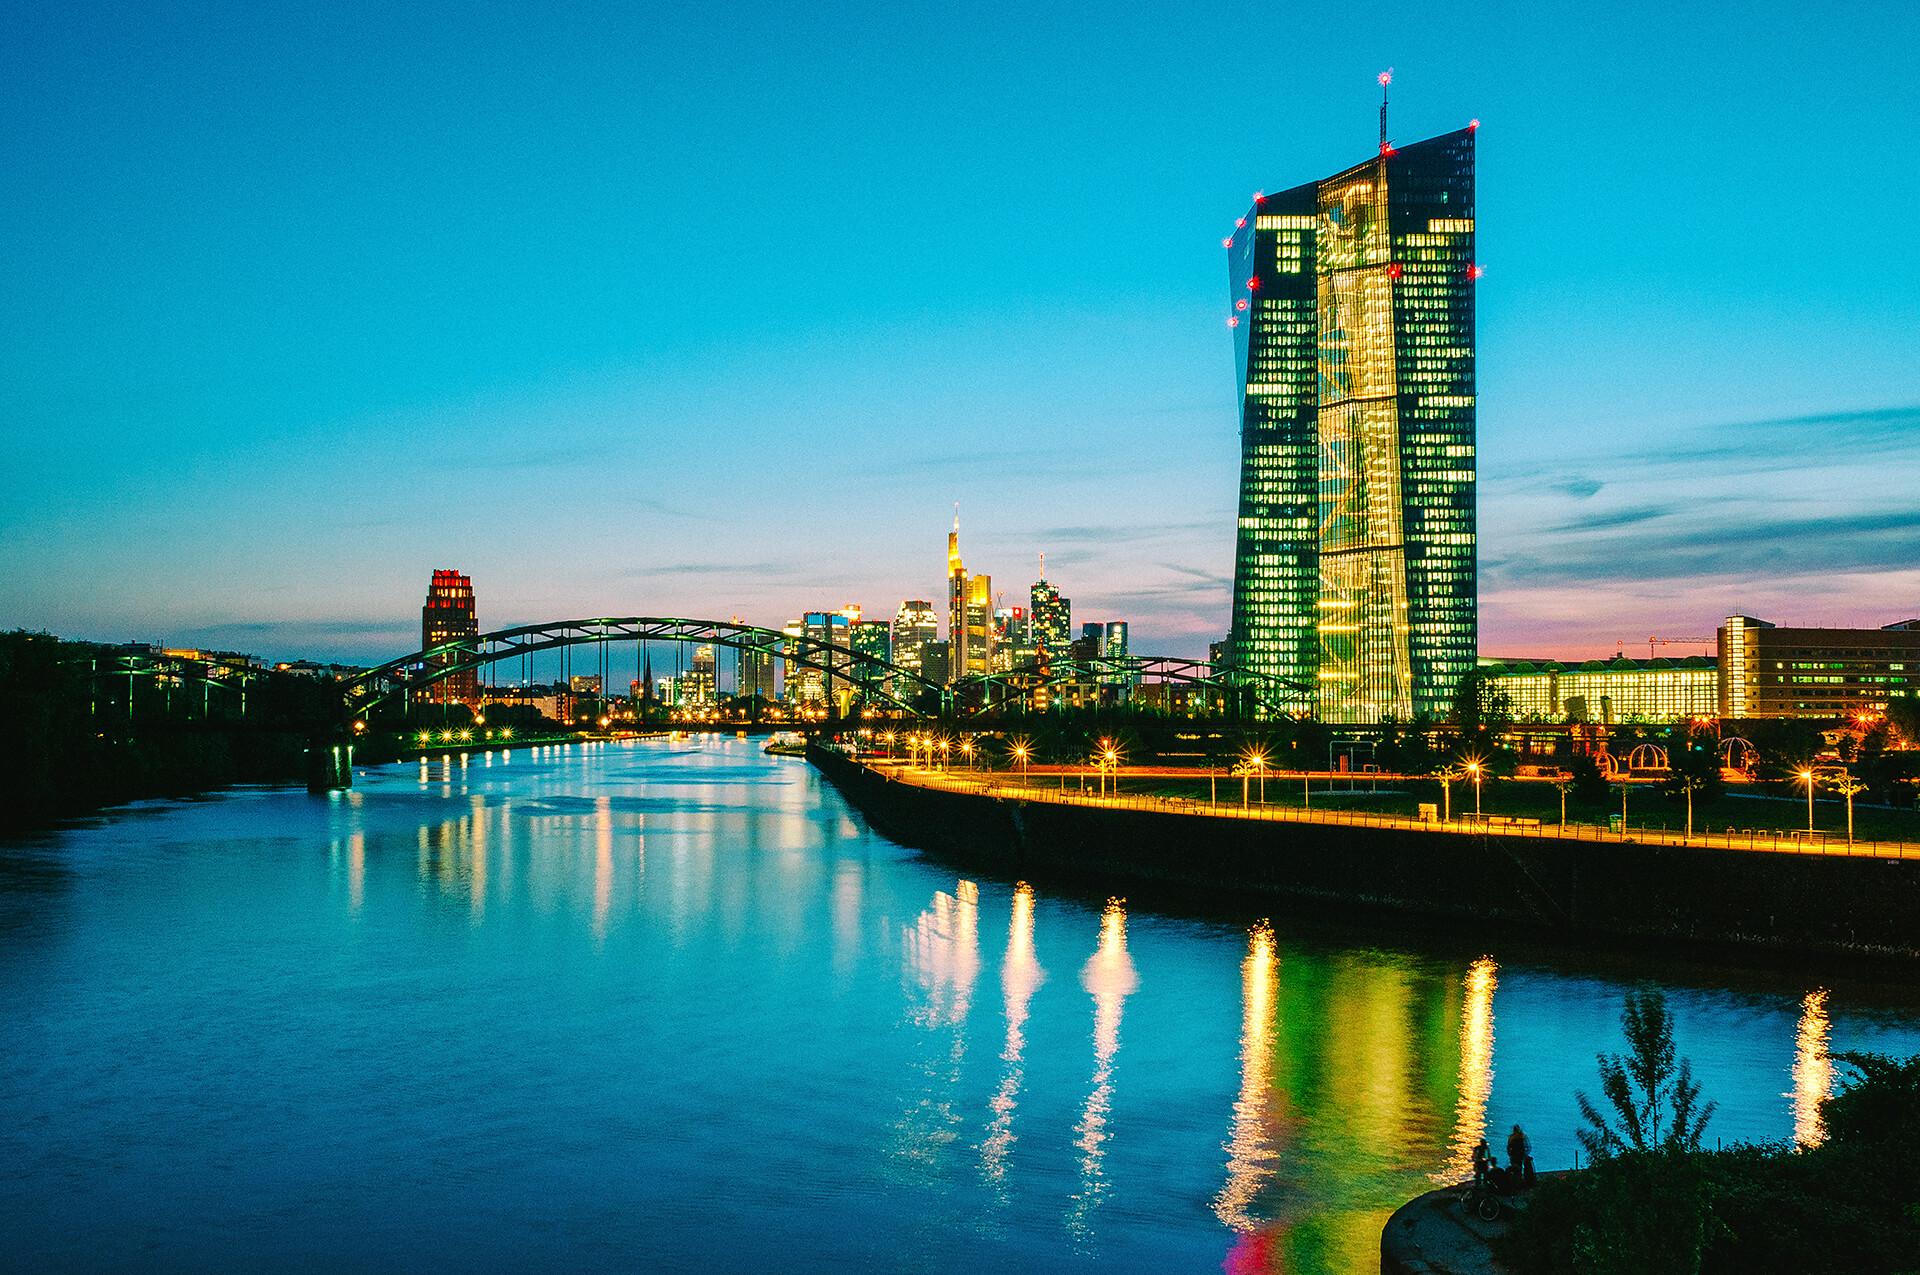 germany-frankfurt-night-blue-architecture